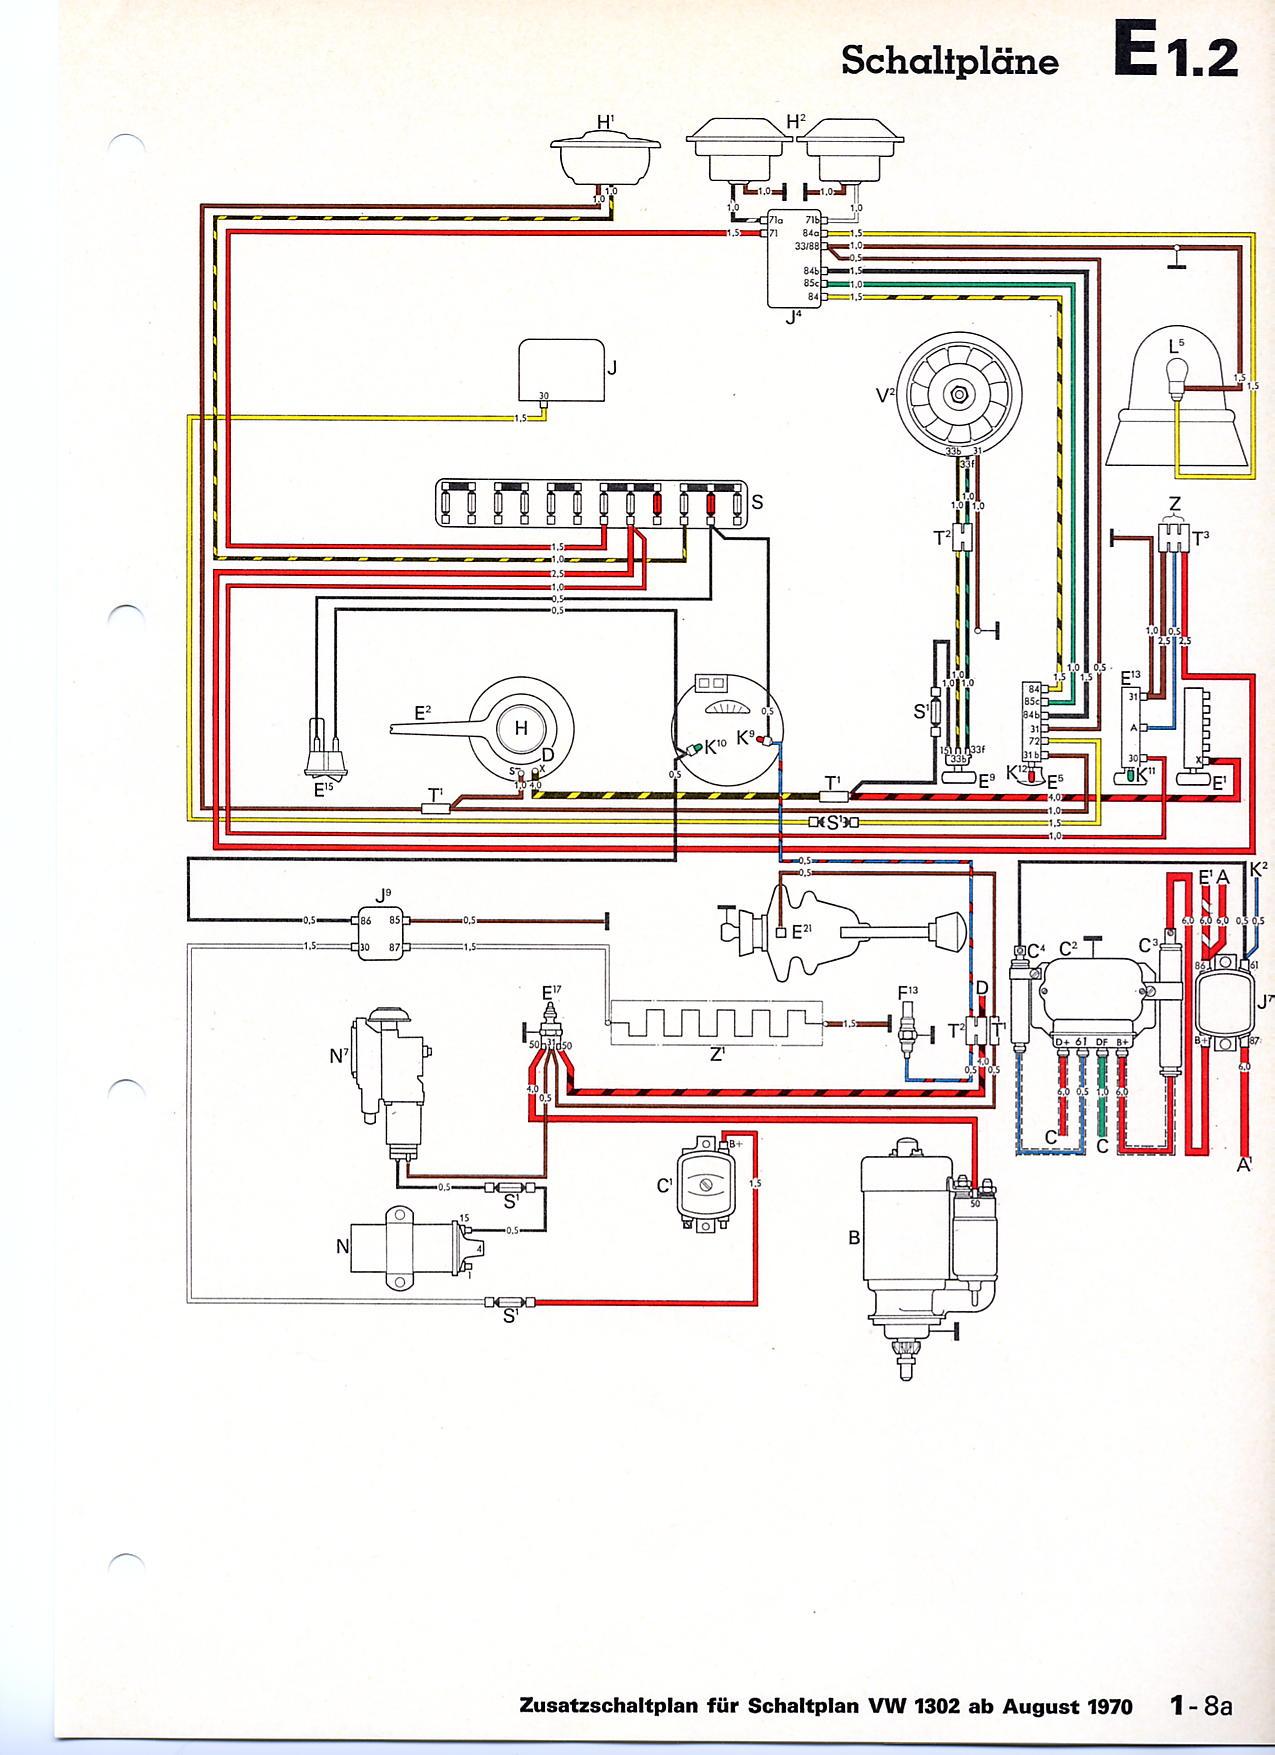 1967 thunderbird turn signal diagram wiring schematic ft 5486  wiring additionally vw super beetle wiring diagram also  vw super beetle wiring diagram